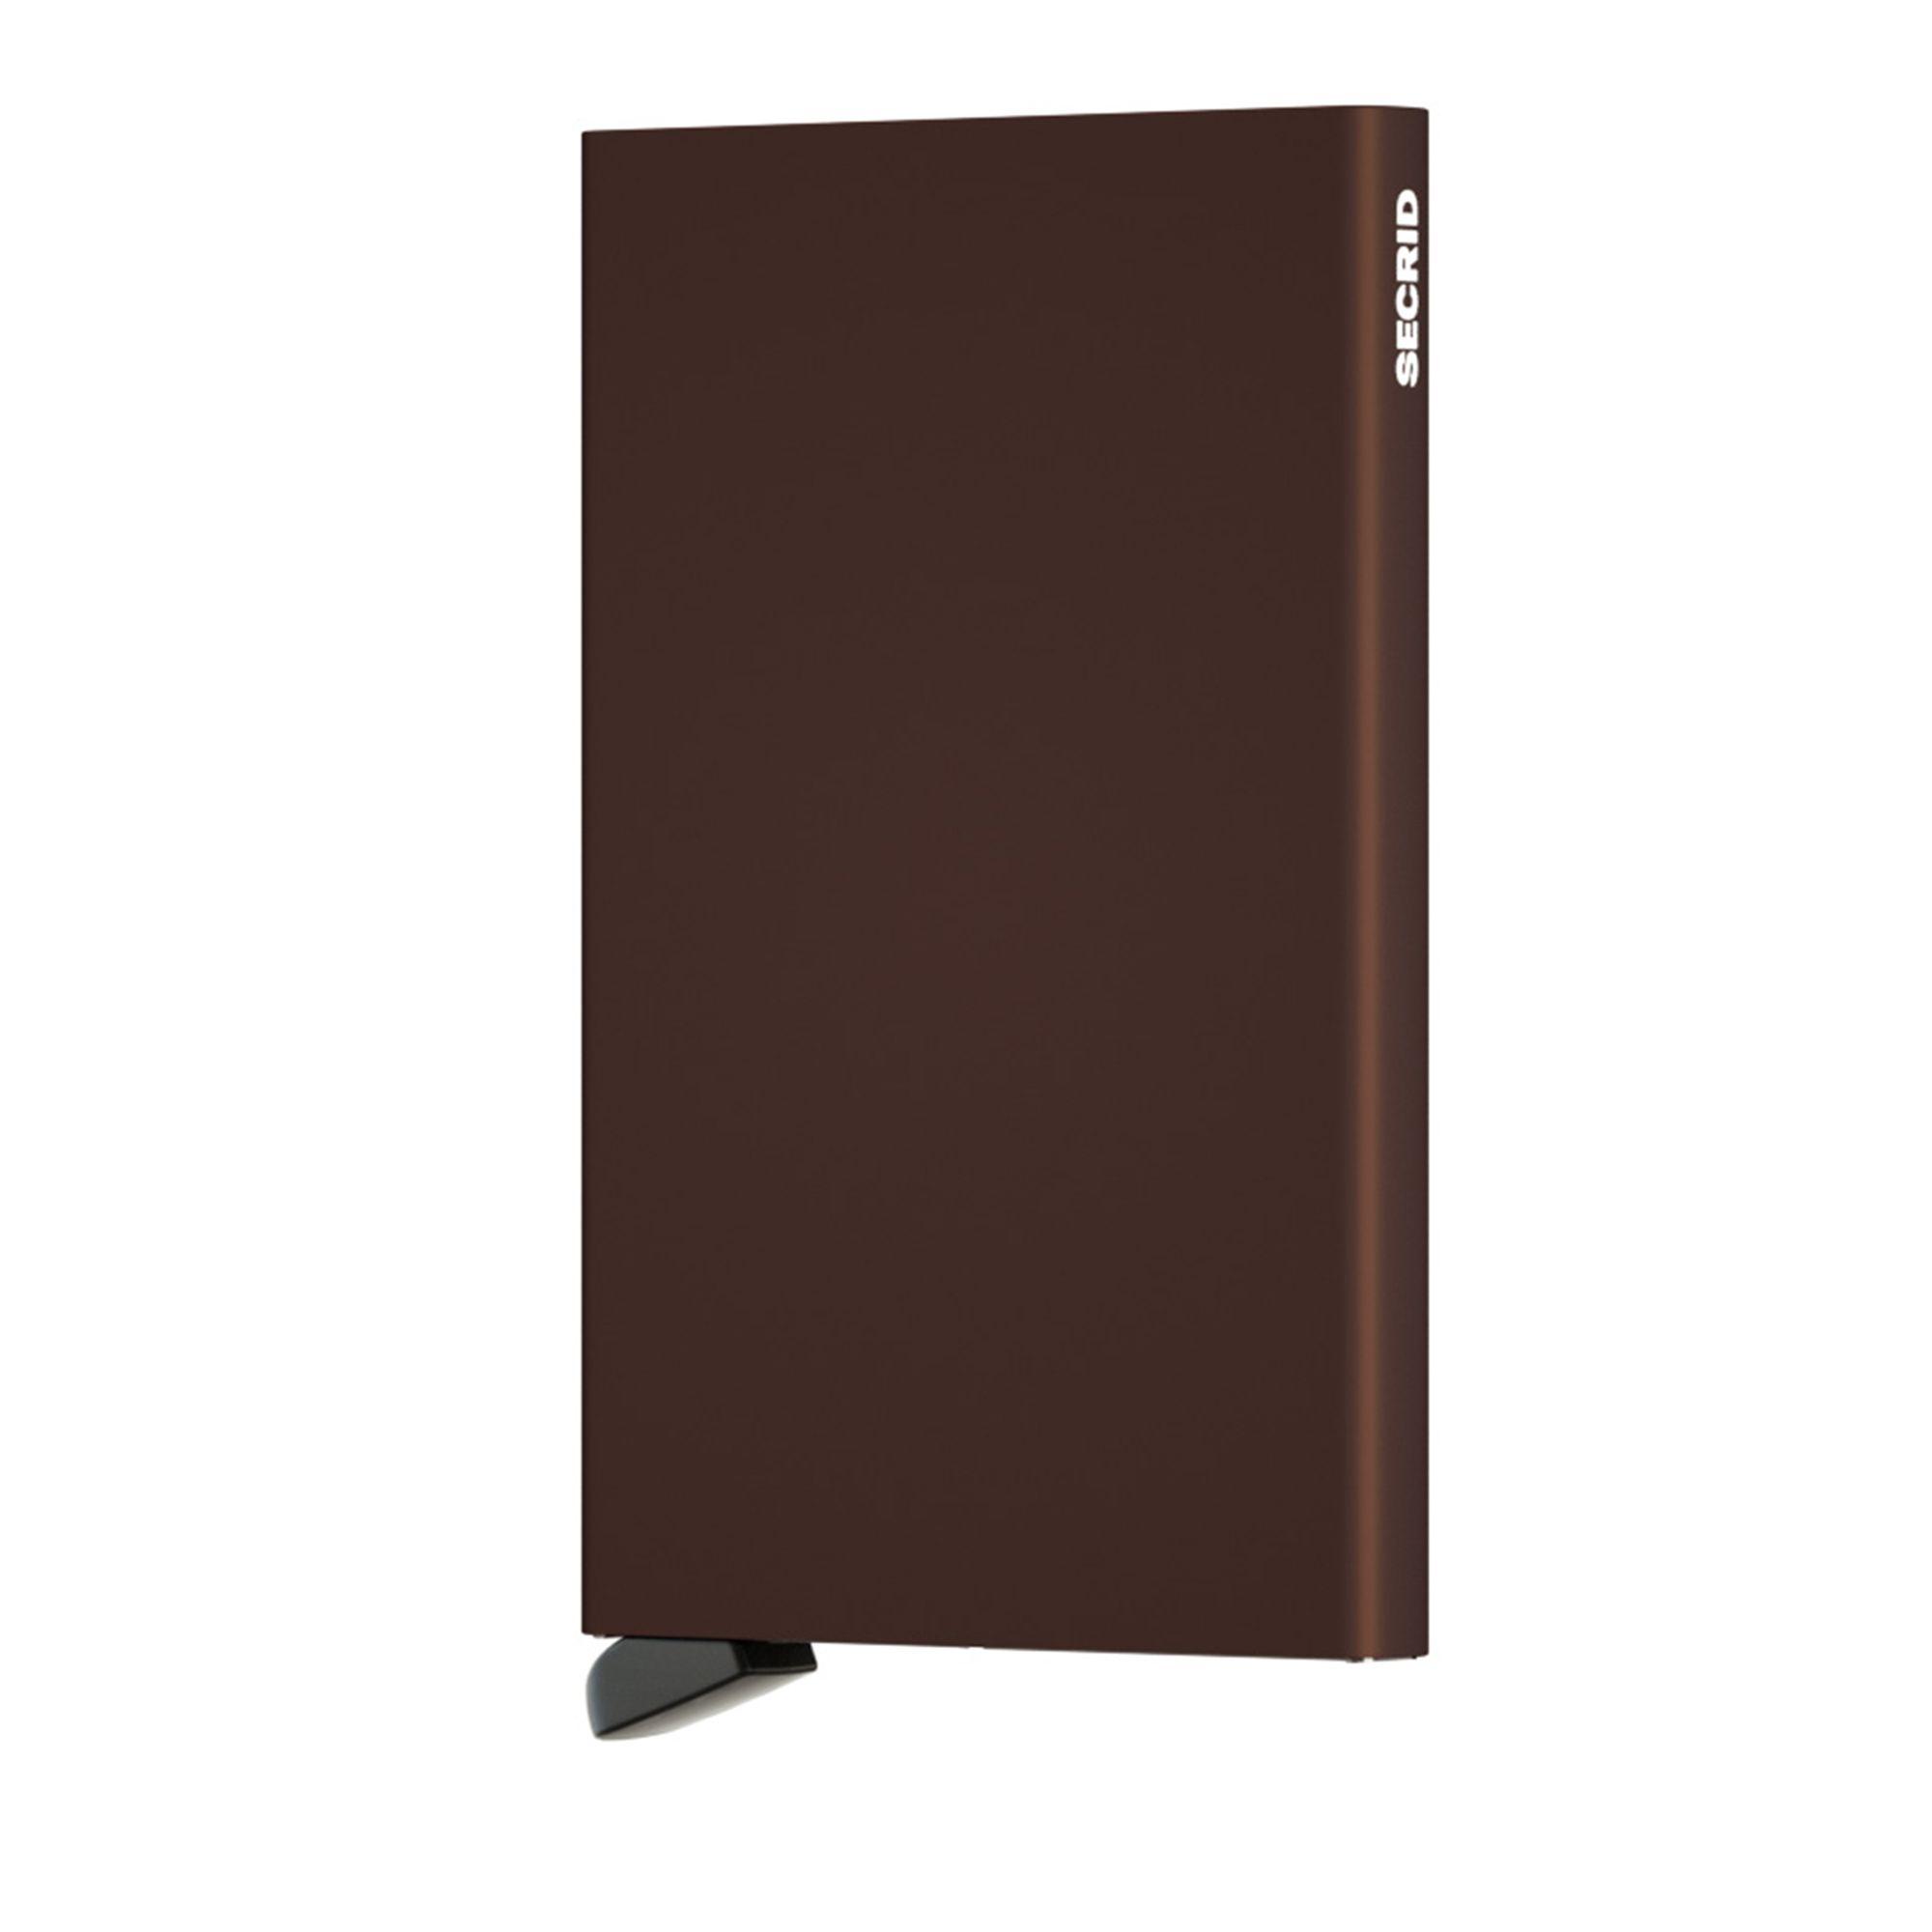 Secrid Cardprotector korthållare i metall, 6 kortfack, Brun